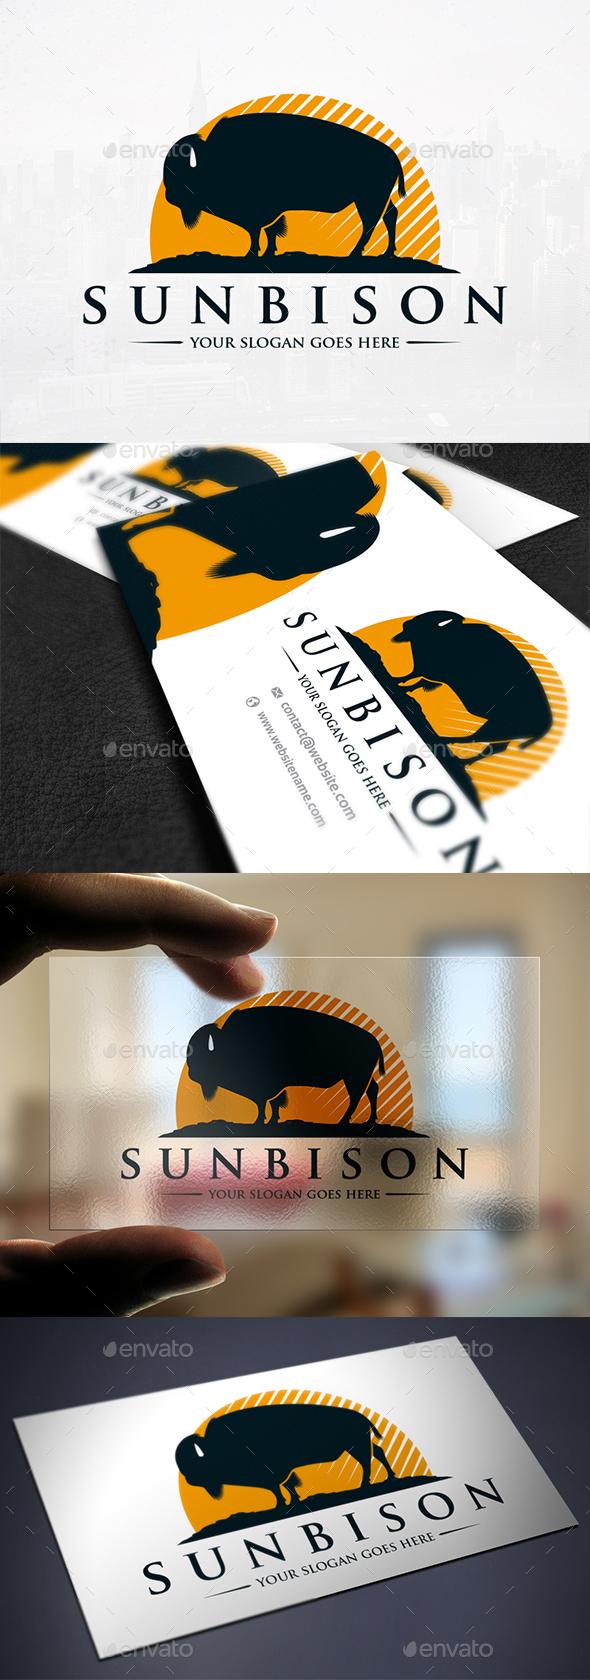 Sun Bison Logo Template - Animals Logo Templates